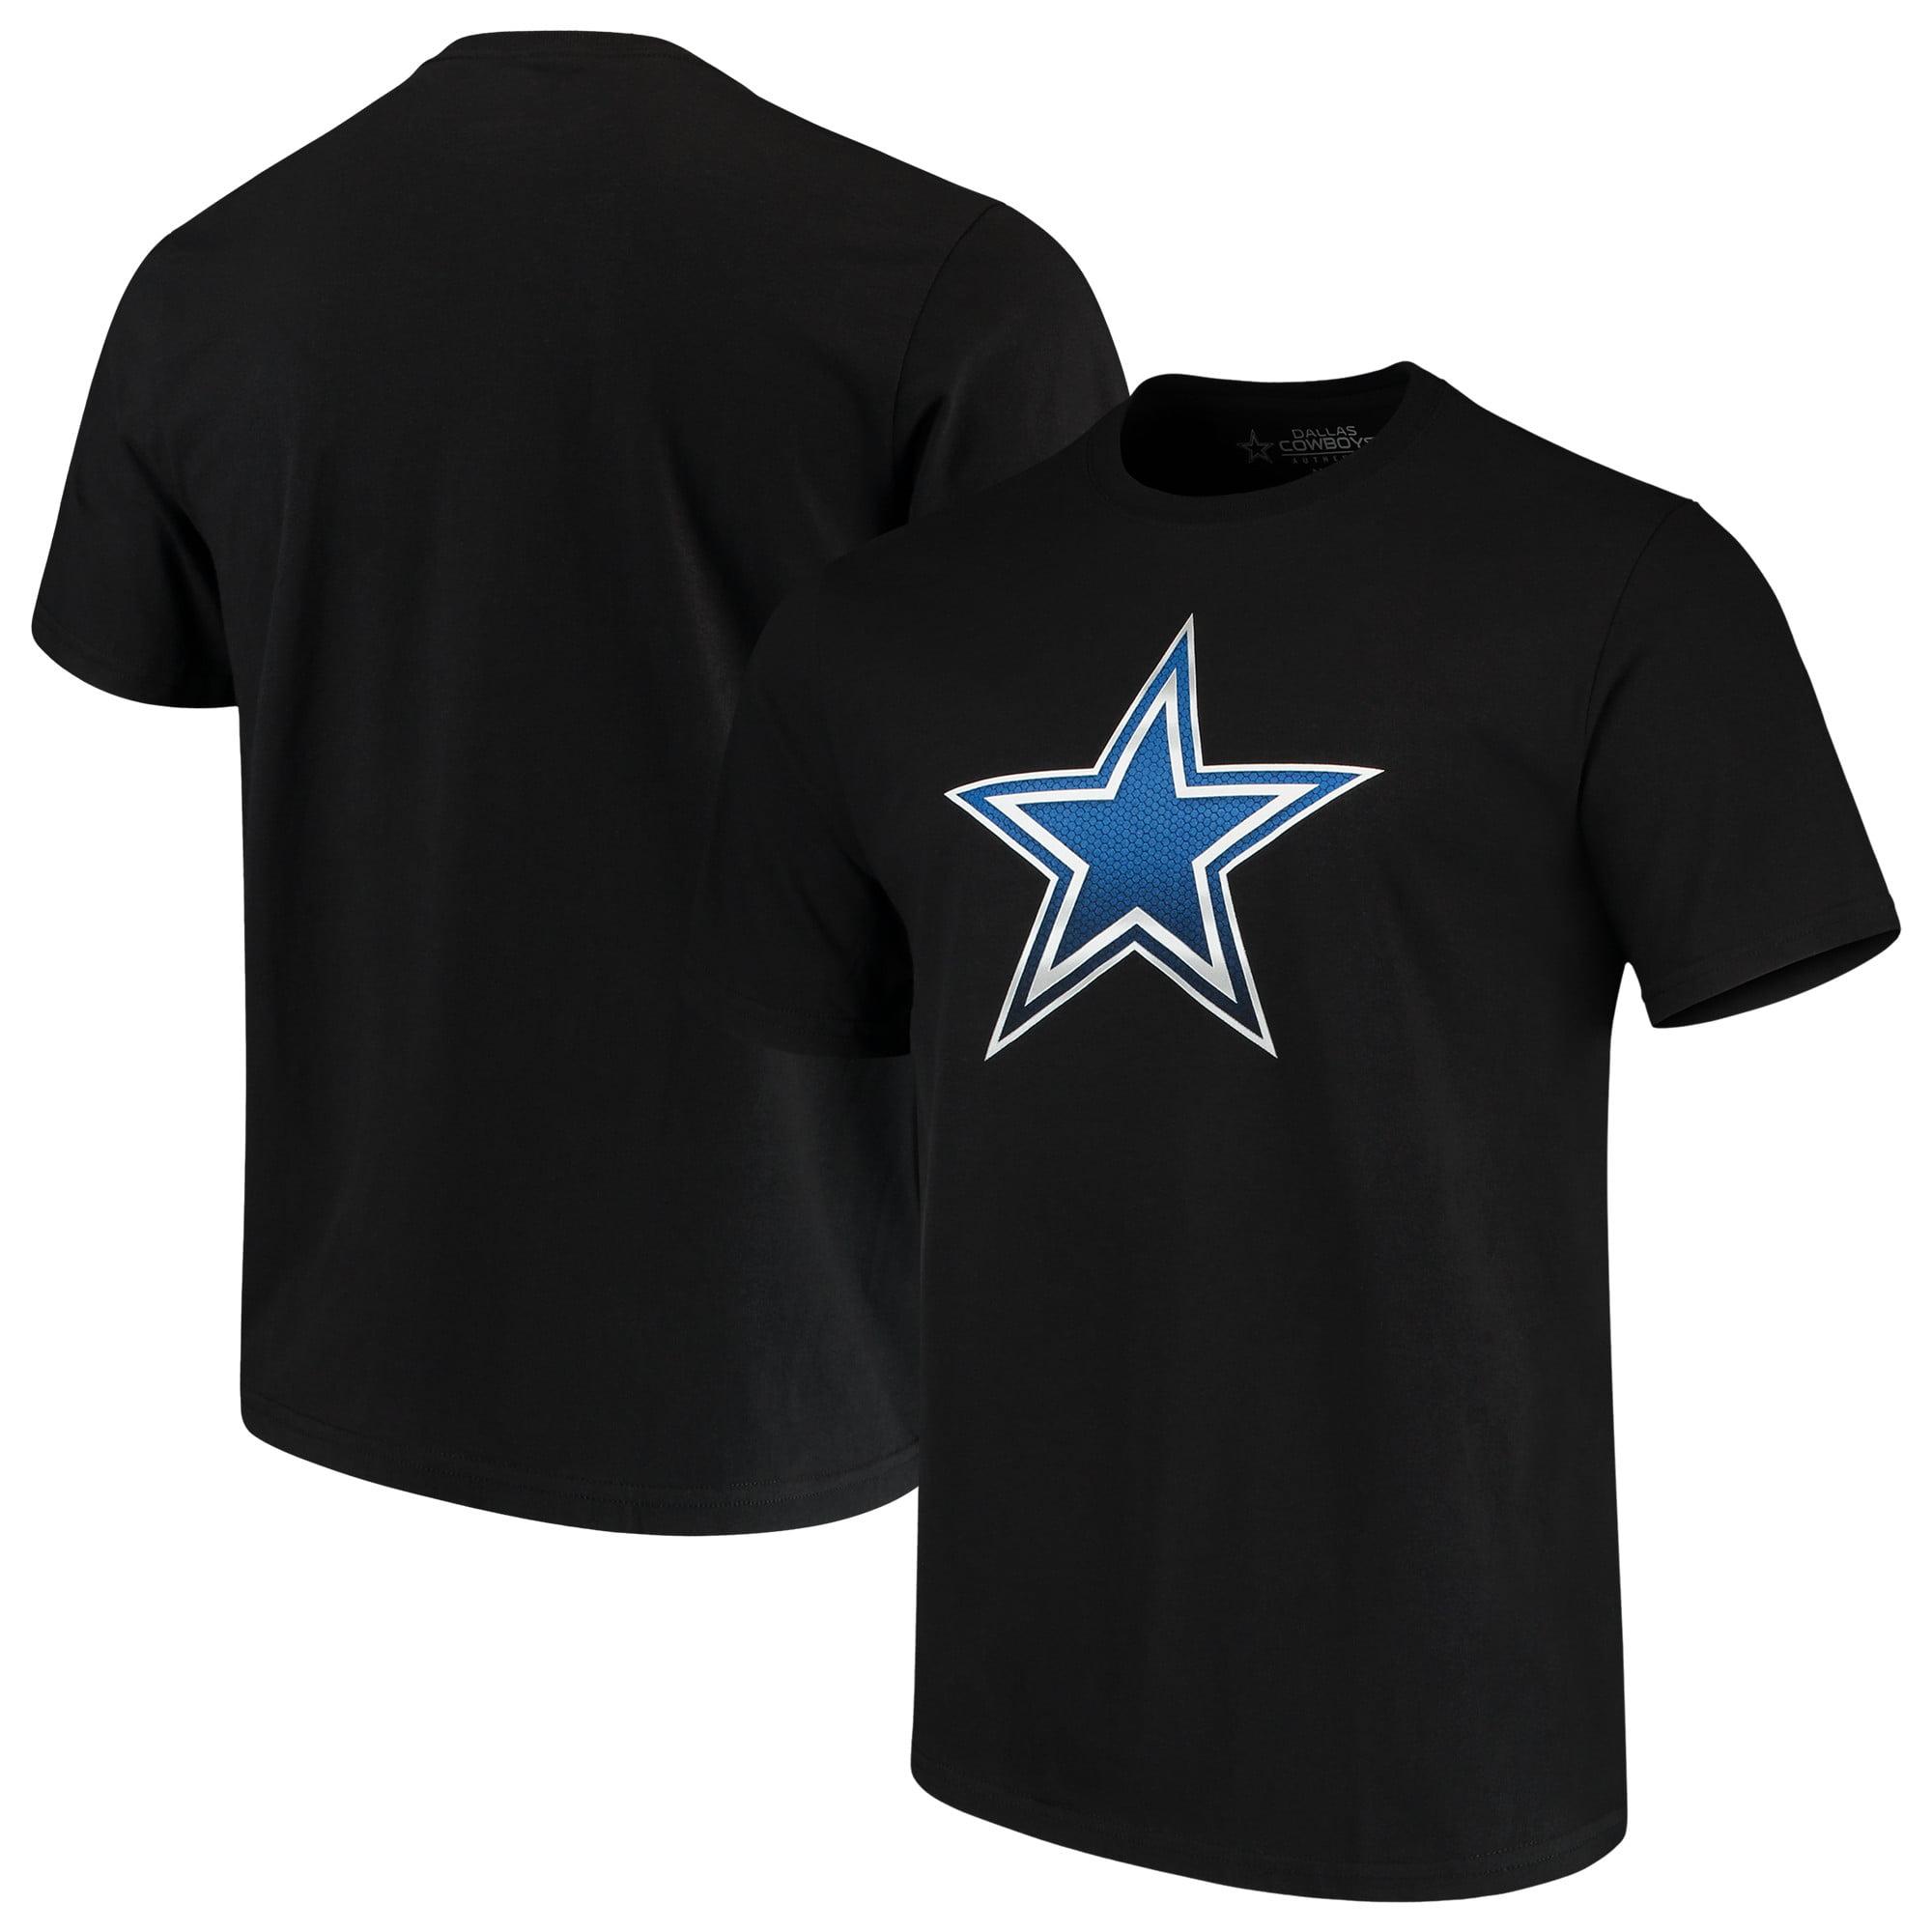 5d8d901fd Dallas cowboys merchandise mens black dallas cowboys keen star shirt jpg  2000x2000 Black dallas star